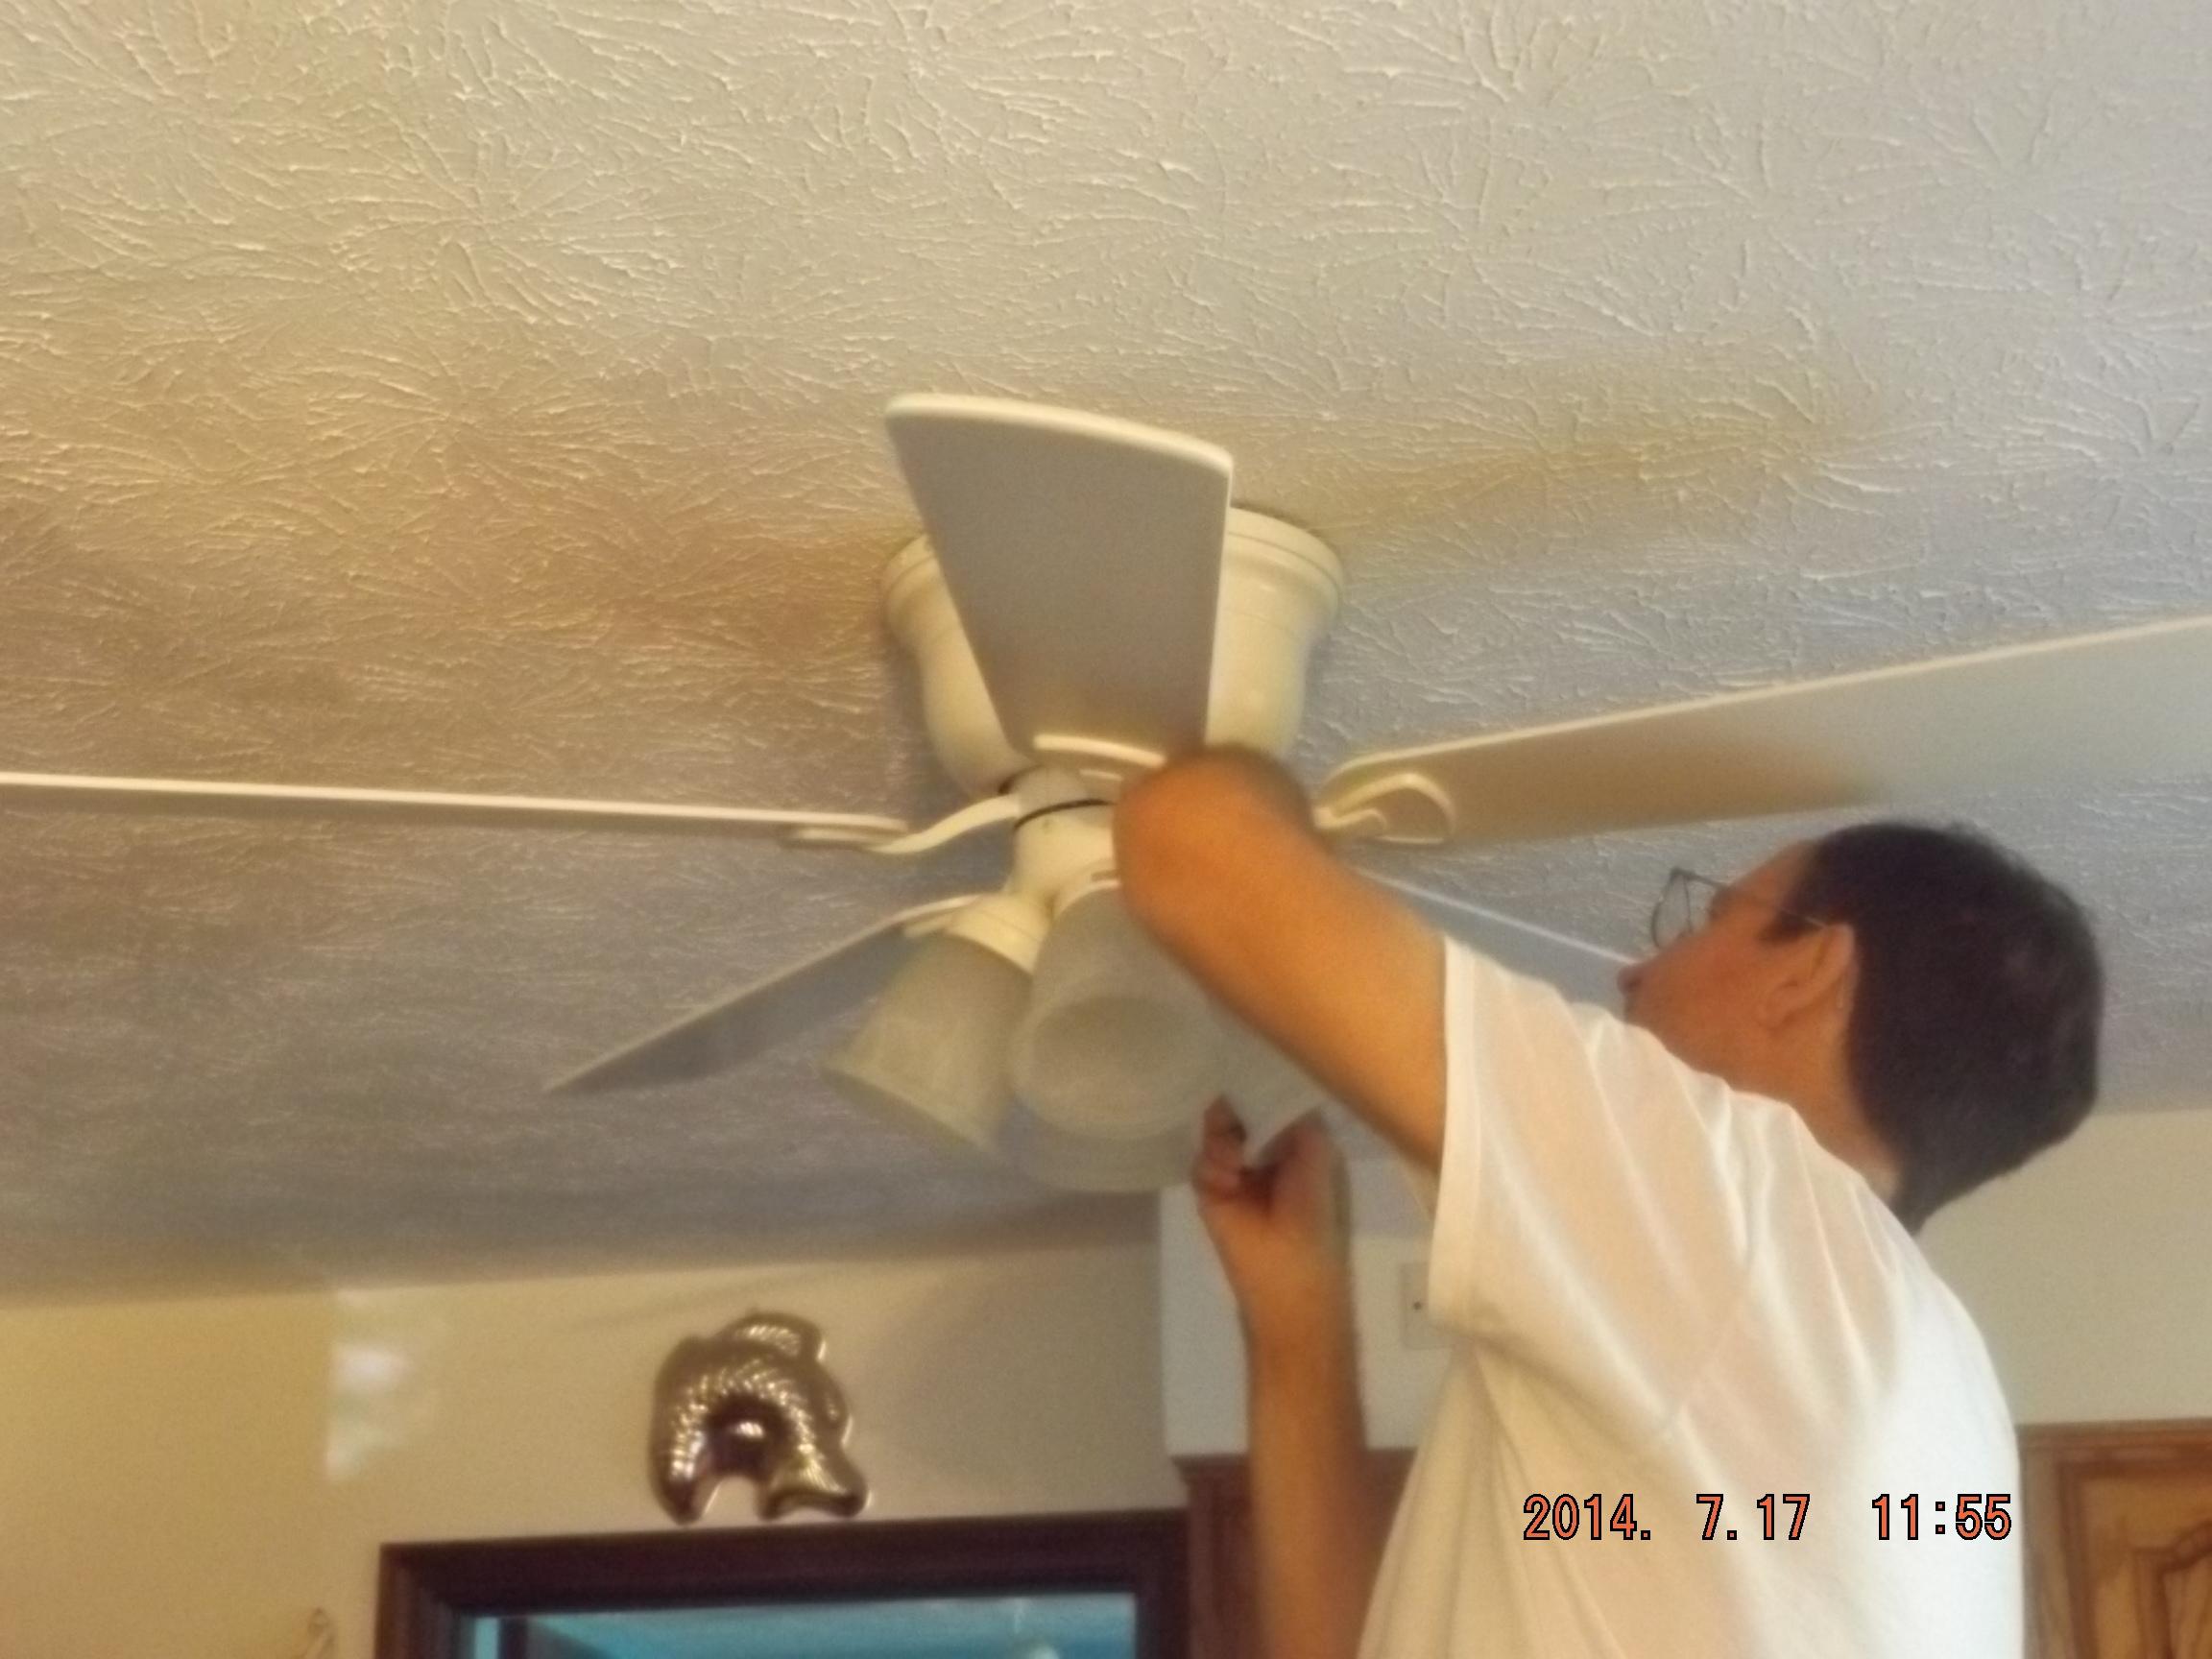 DIY – Hanging a ceiling fan – DIY with Kathy